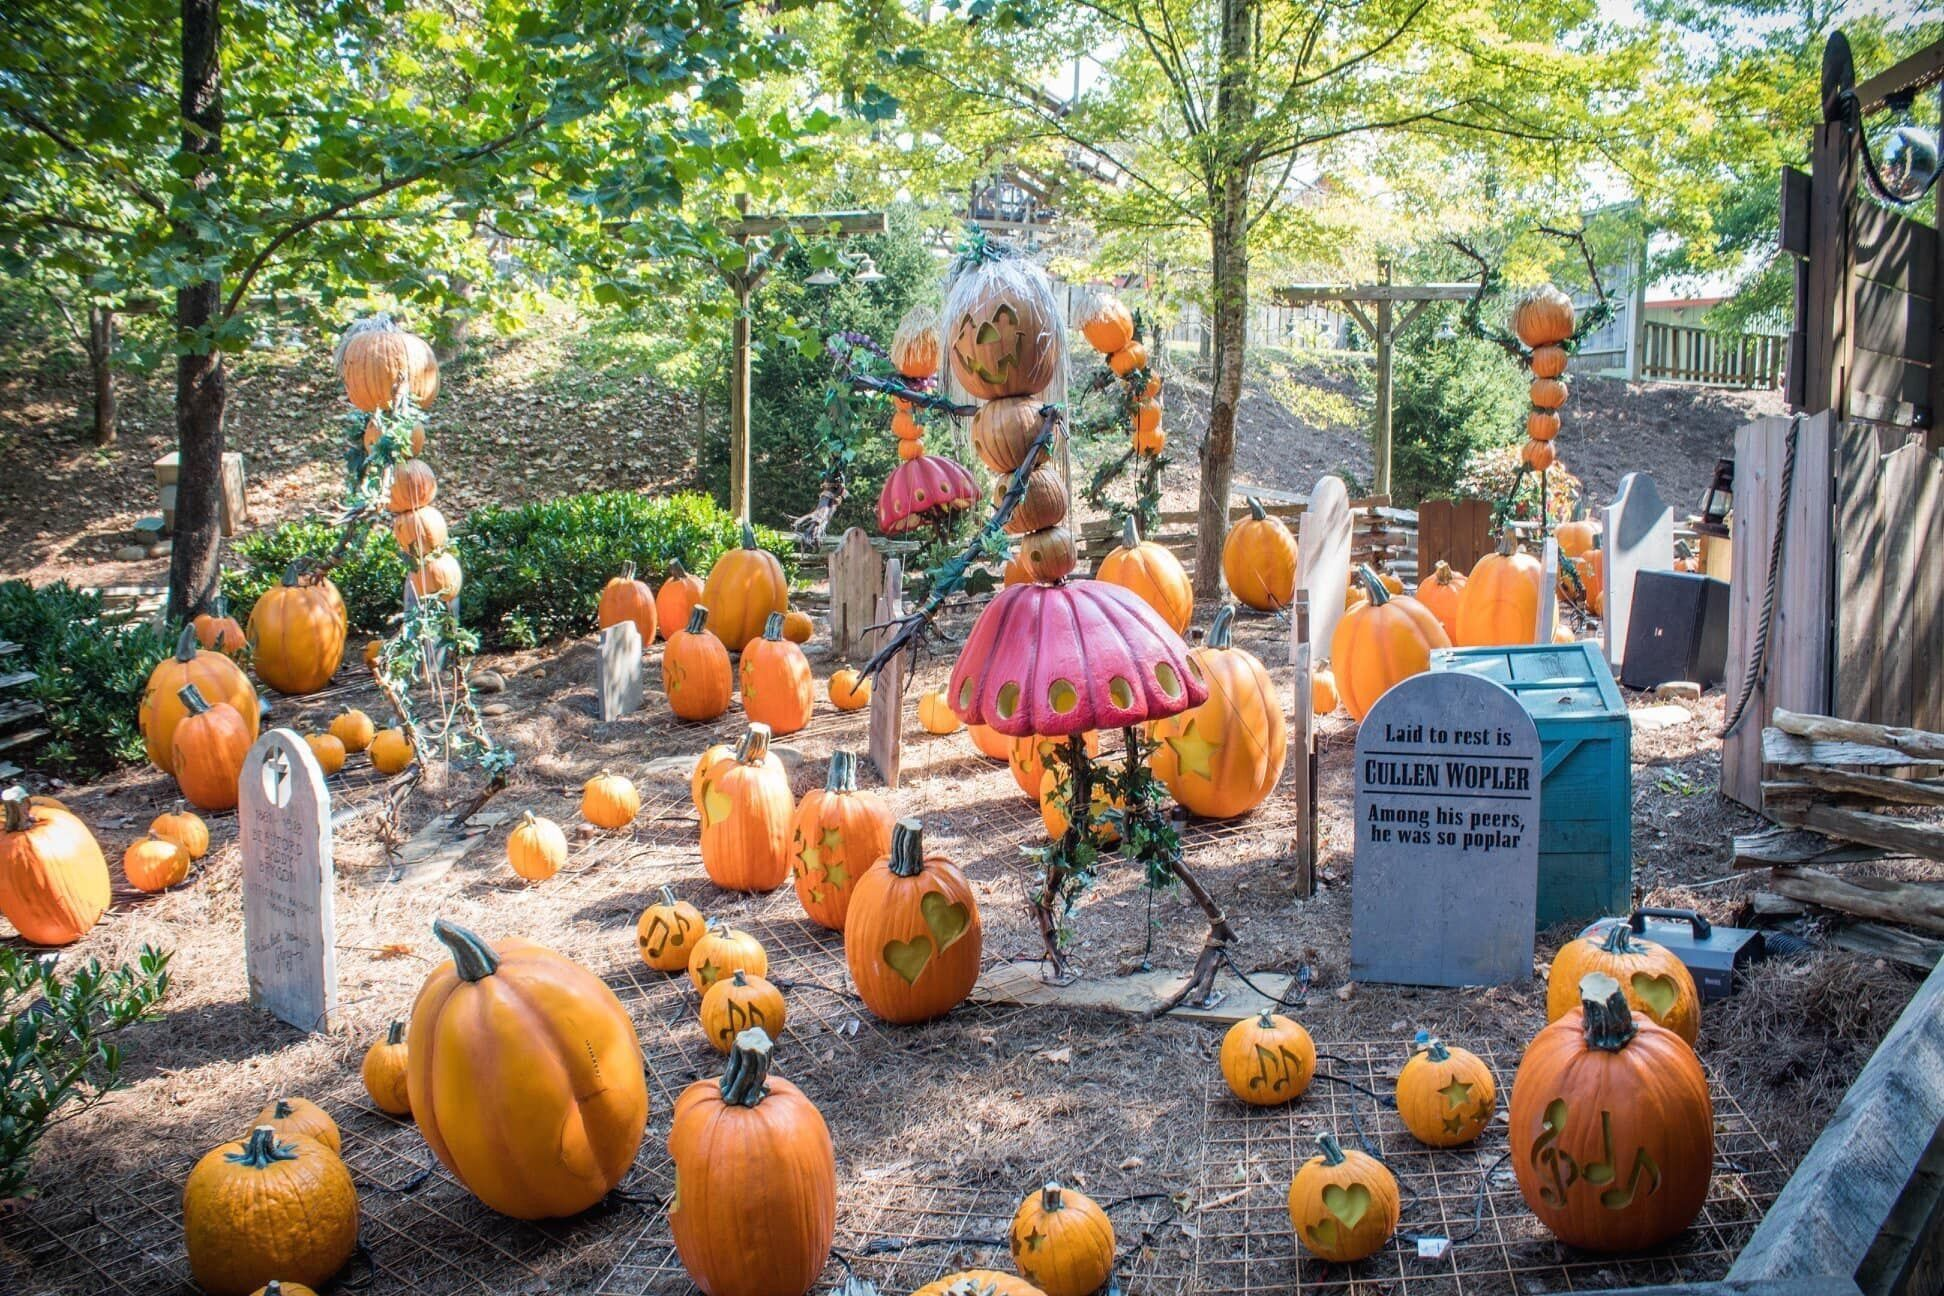 Dollywood S Harvest Festival Great Pumpkin Luminights Features Artistic Sculp 1000 In 2020 Harvest Festival Pumpkin Harvest